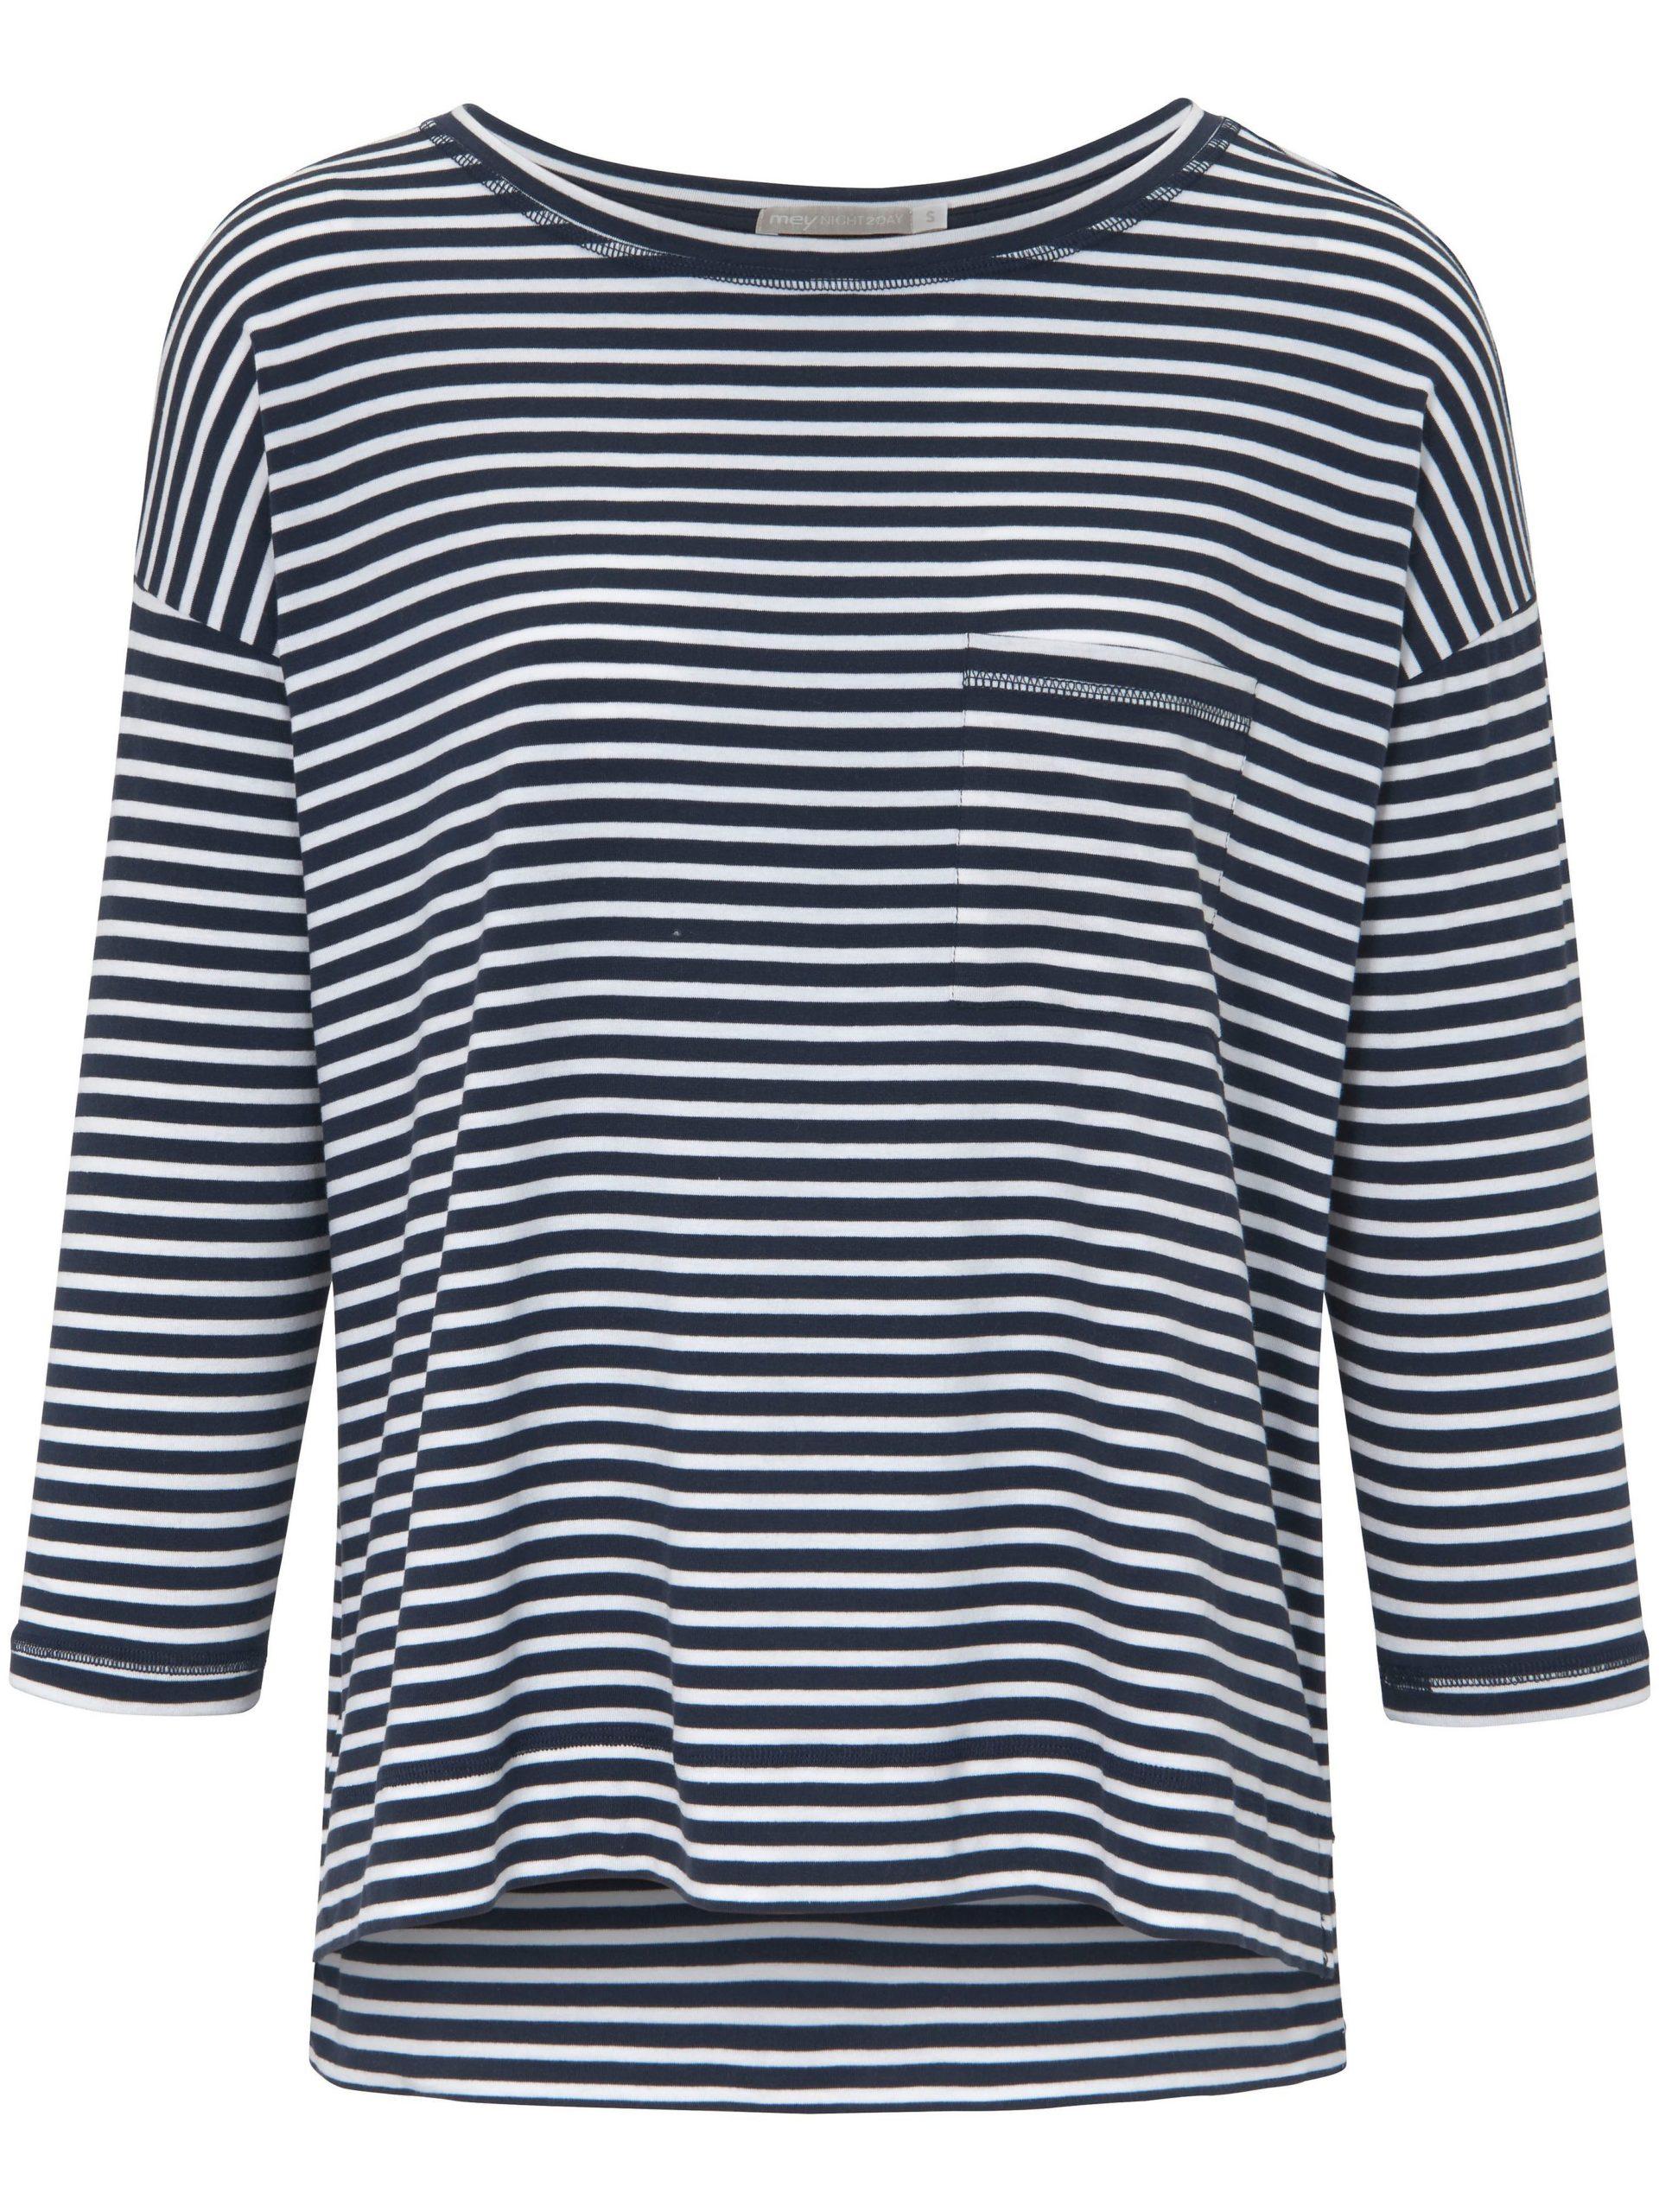 Shirt Van Mey multicolour Kopen